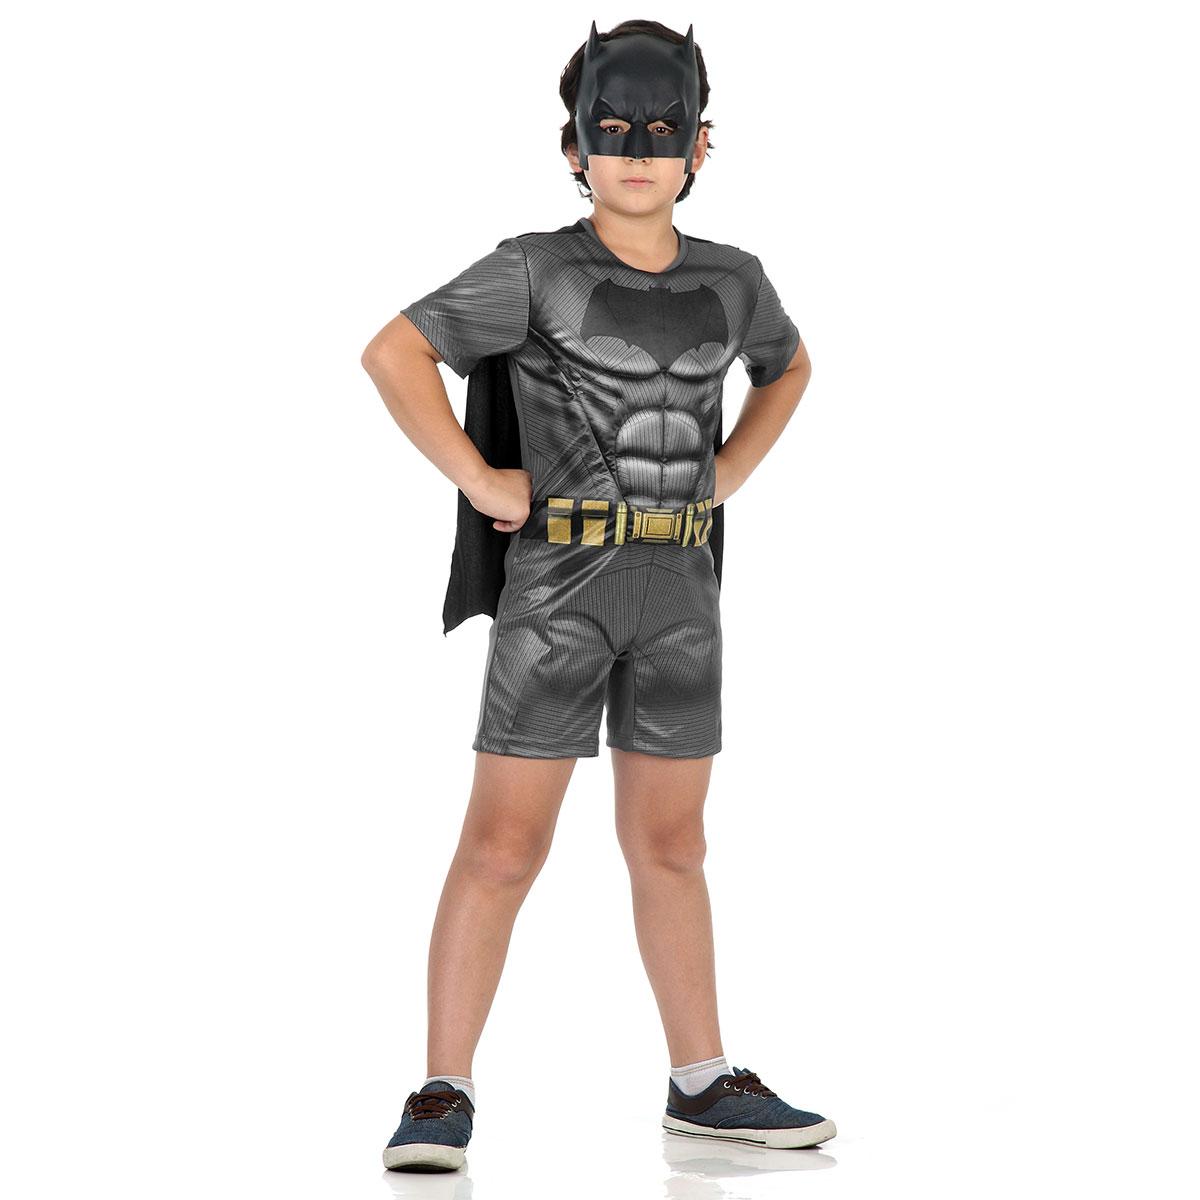 Fantasia Batman Infantil com Músculos